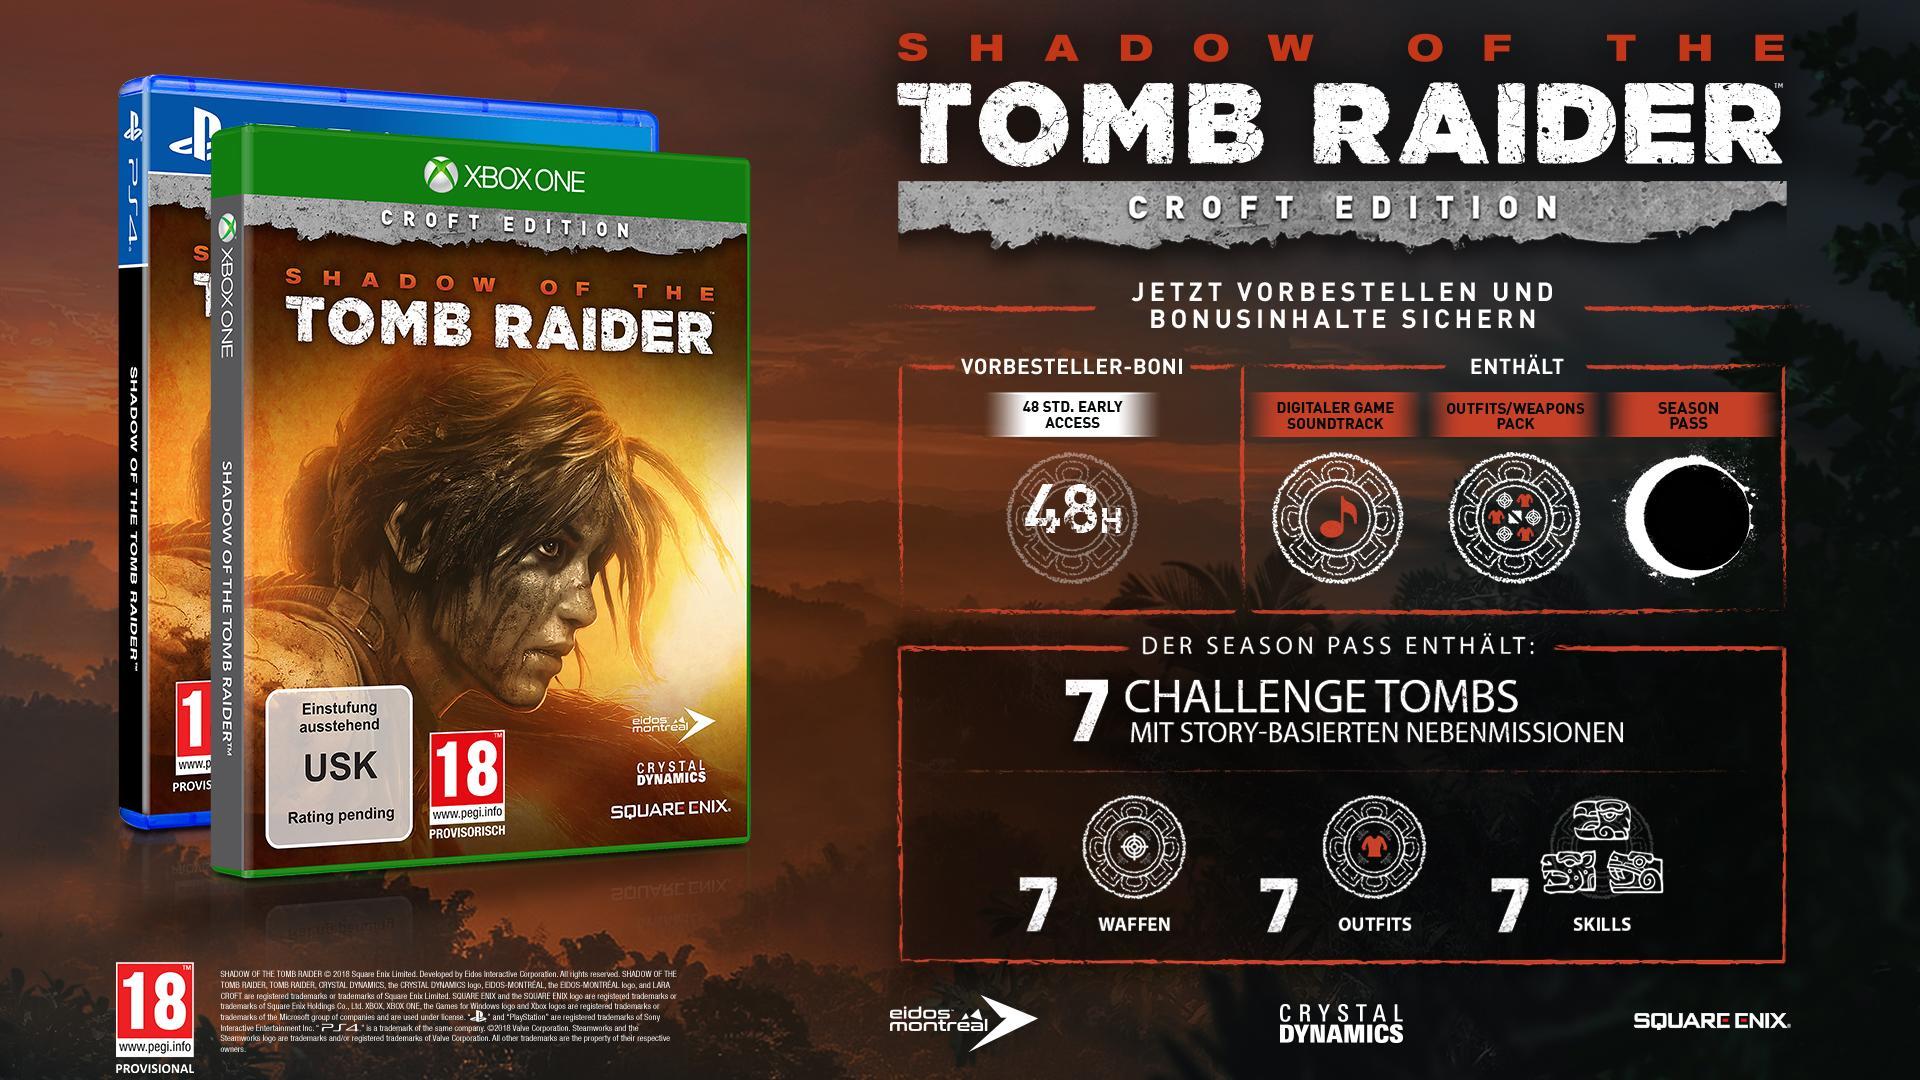 Shadow Of The Tomb Raider Croft Edition Uncut Deutsch At Pegi